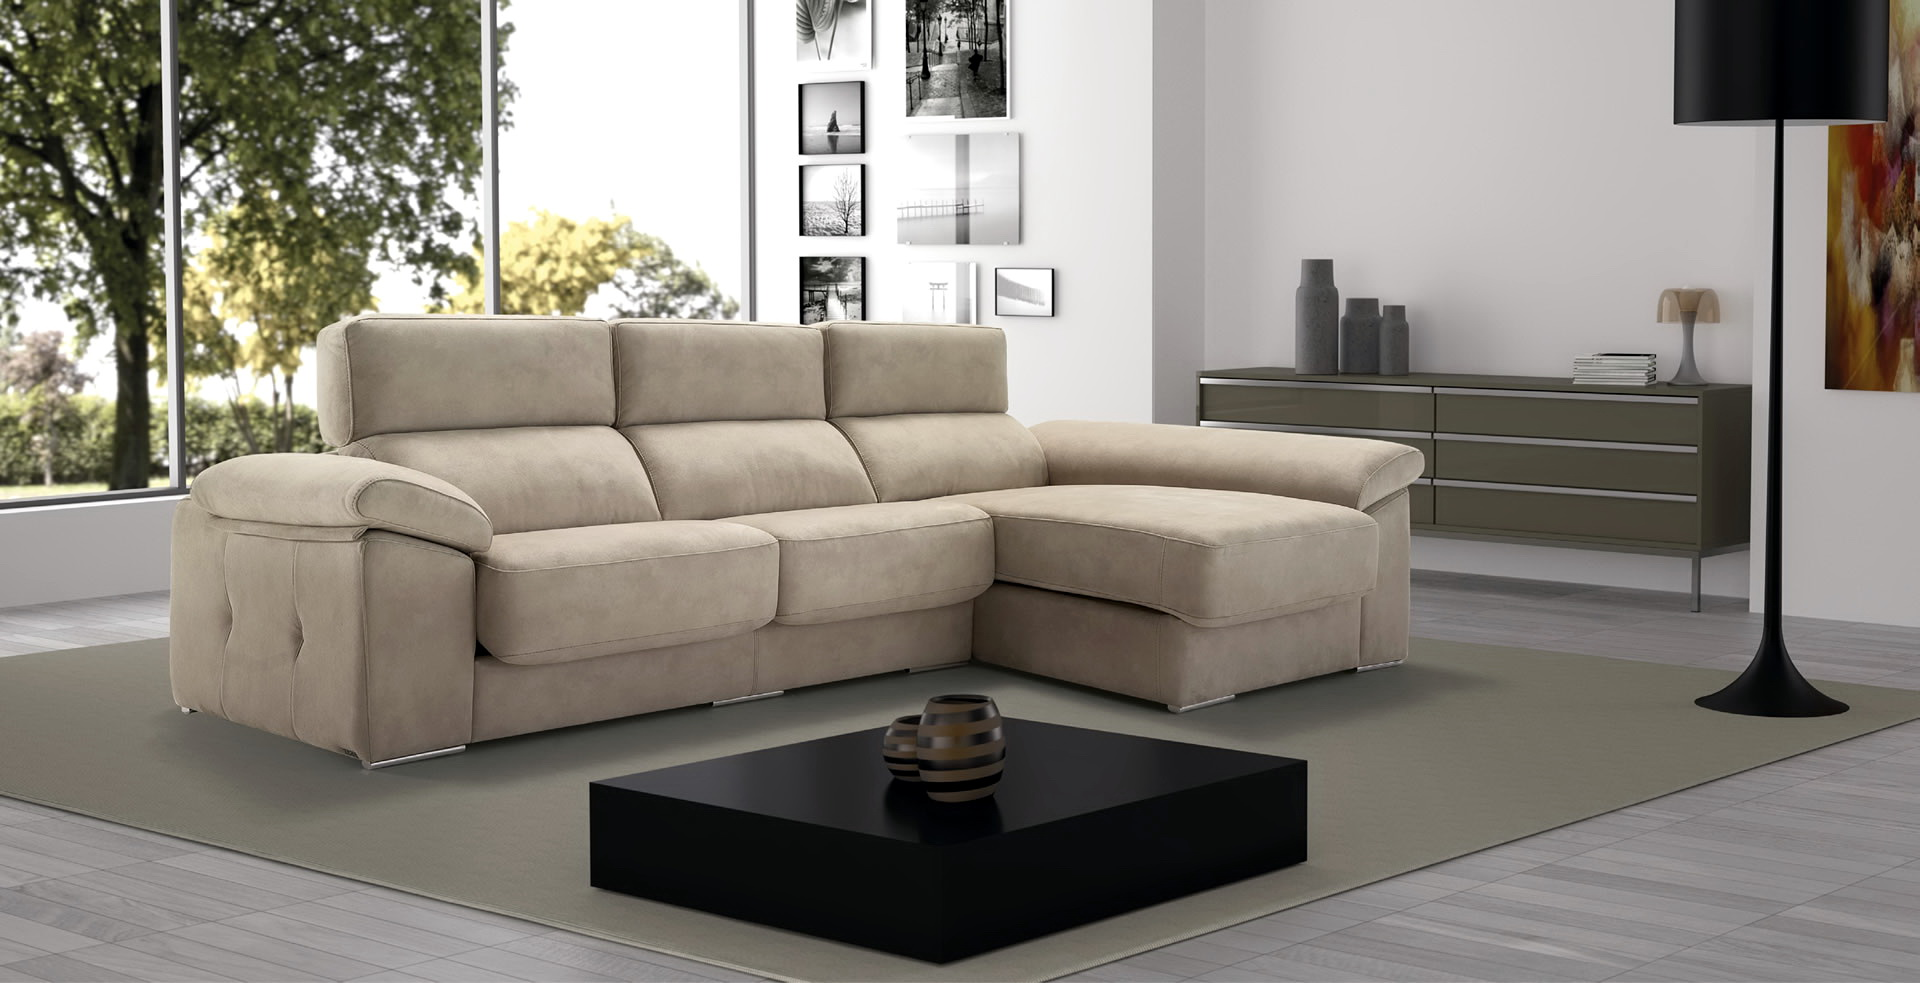 Sofá Chaise-Longue modular asientos extensibles SORIA 11G by Paco Bautista en muebles antoñán® León